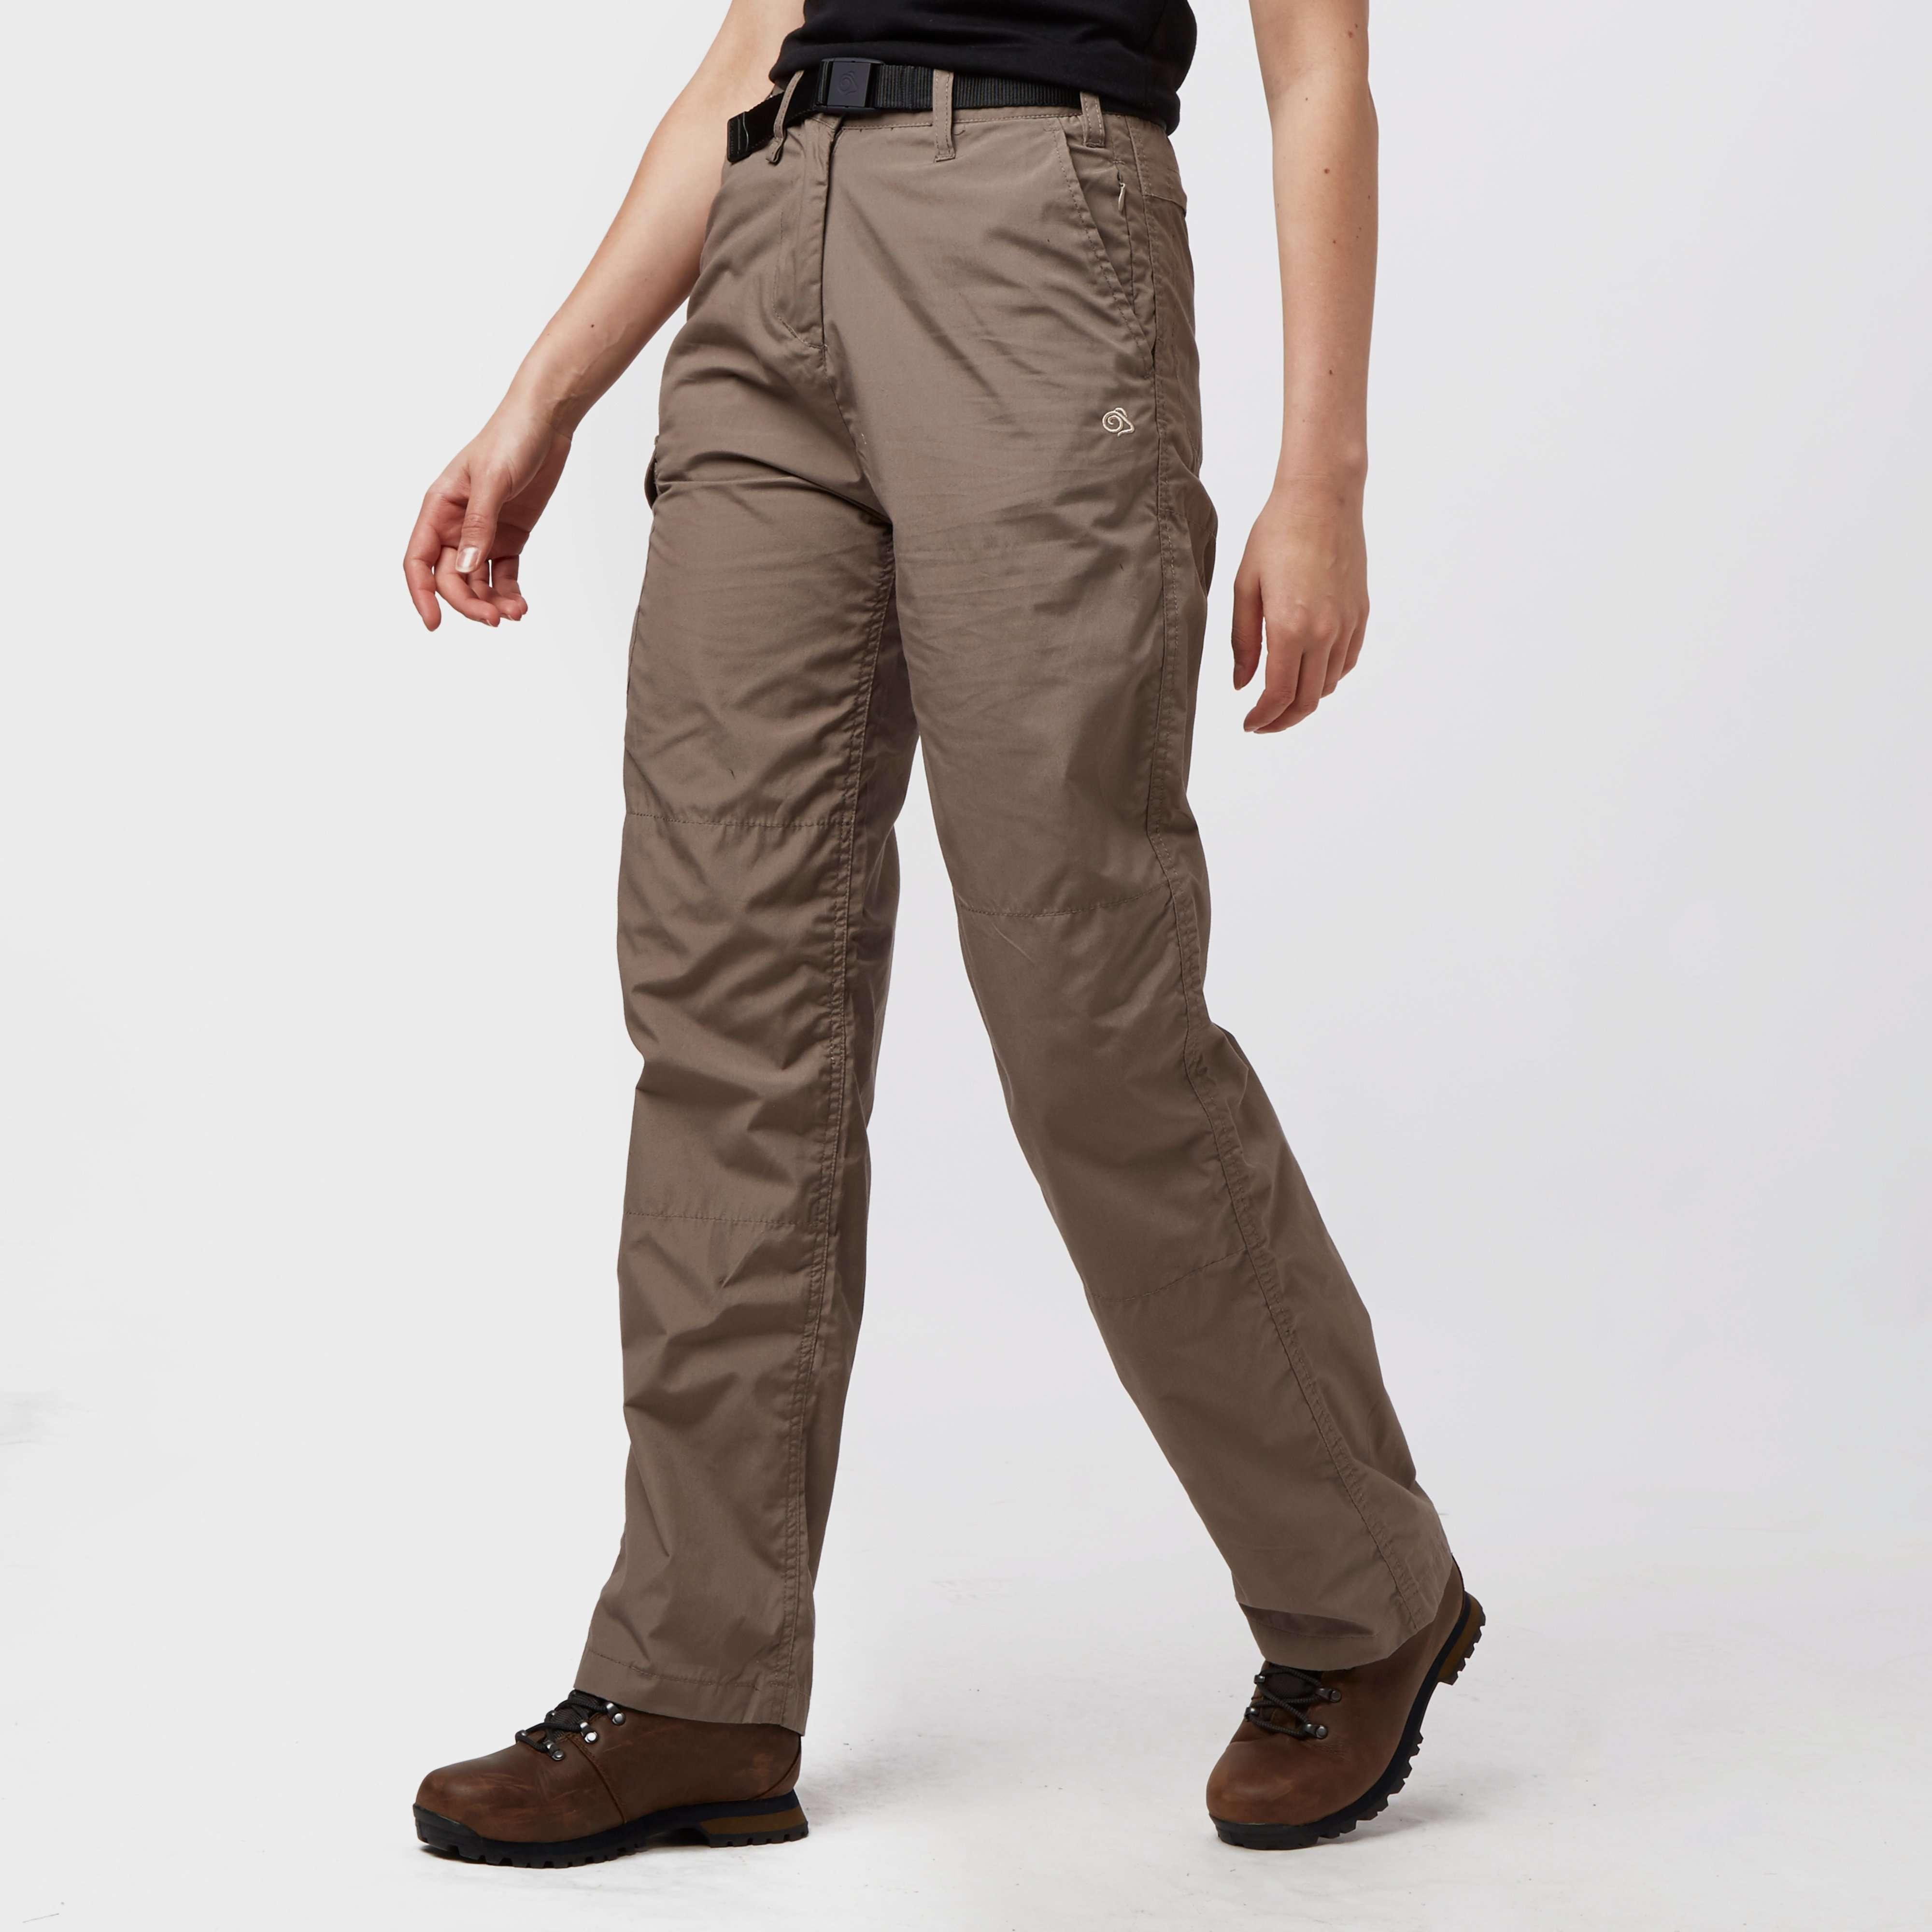 CRAGHOPPERS Women's Classic Kiwi Trousers